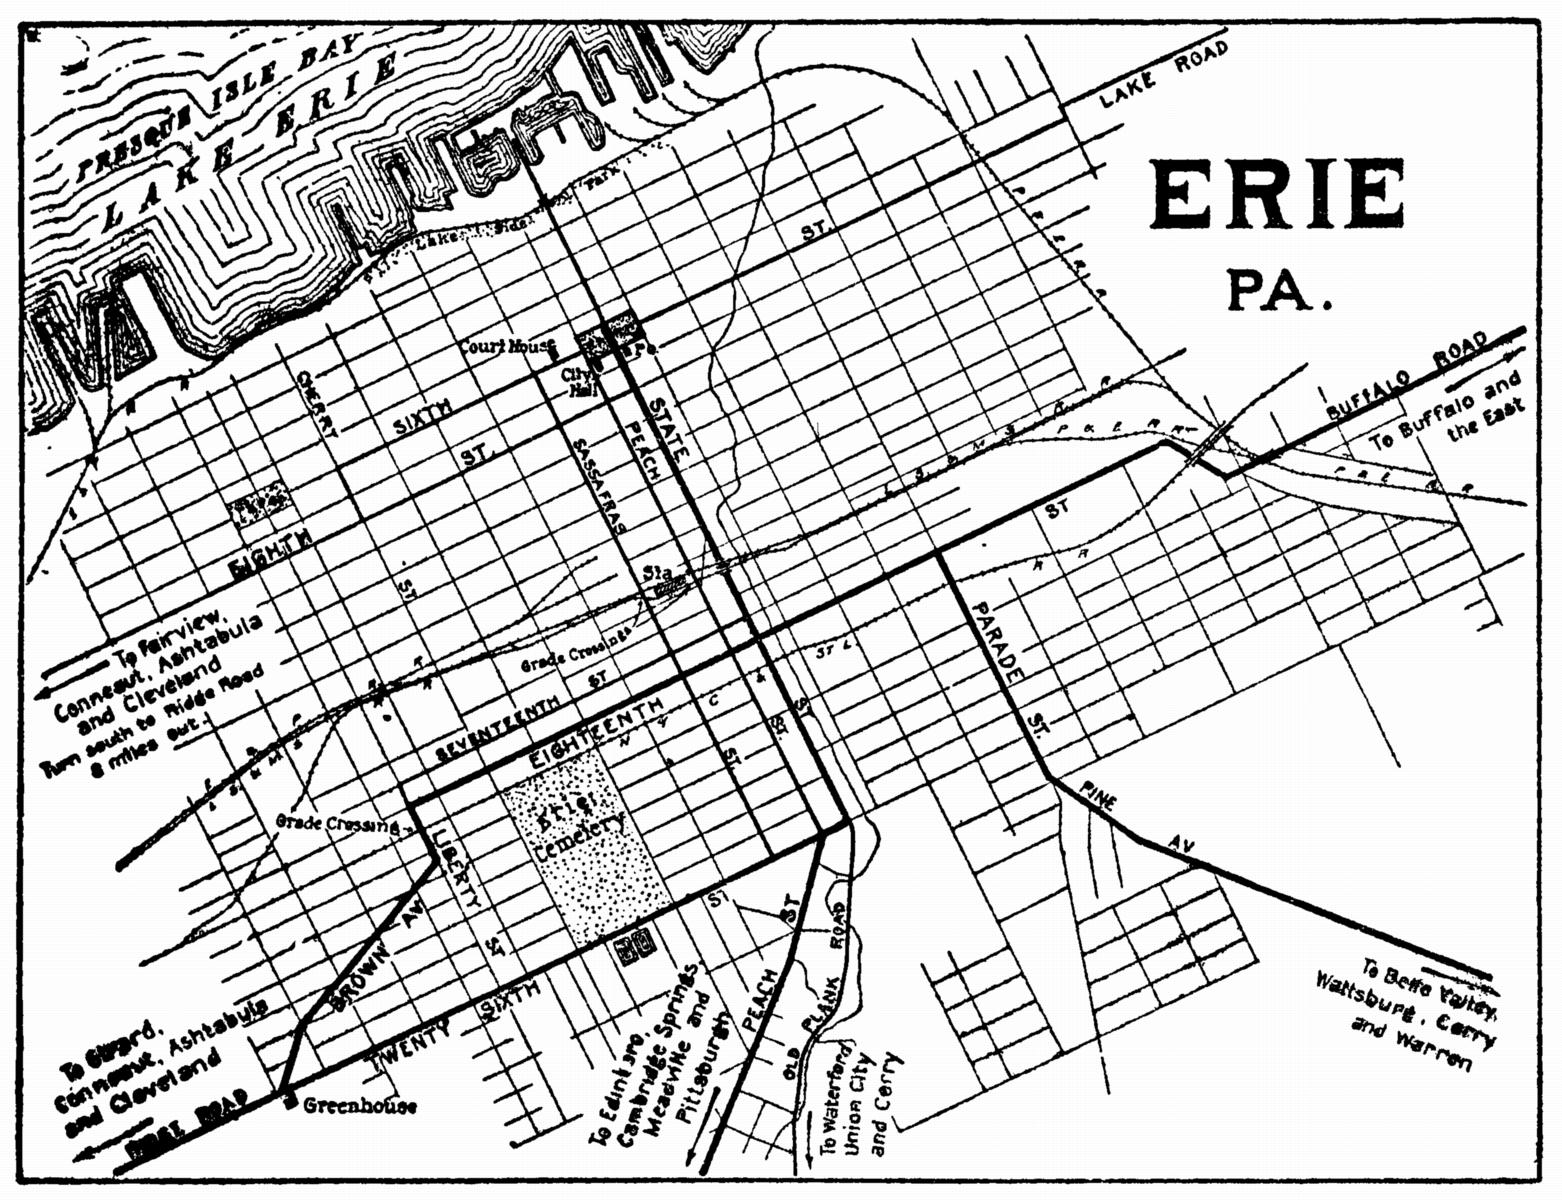 Pennsylvania City Maps At AmericanRoads